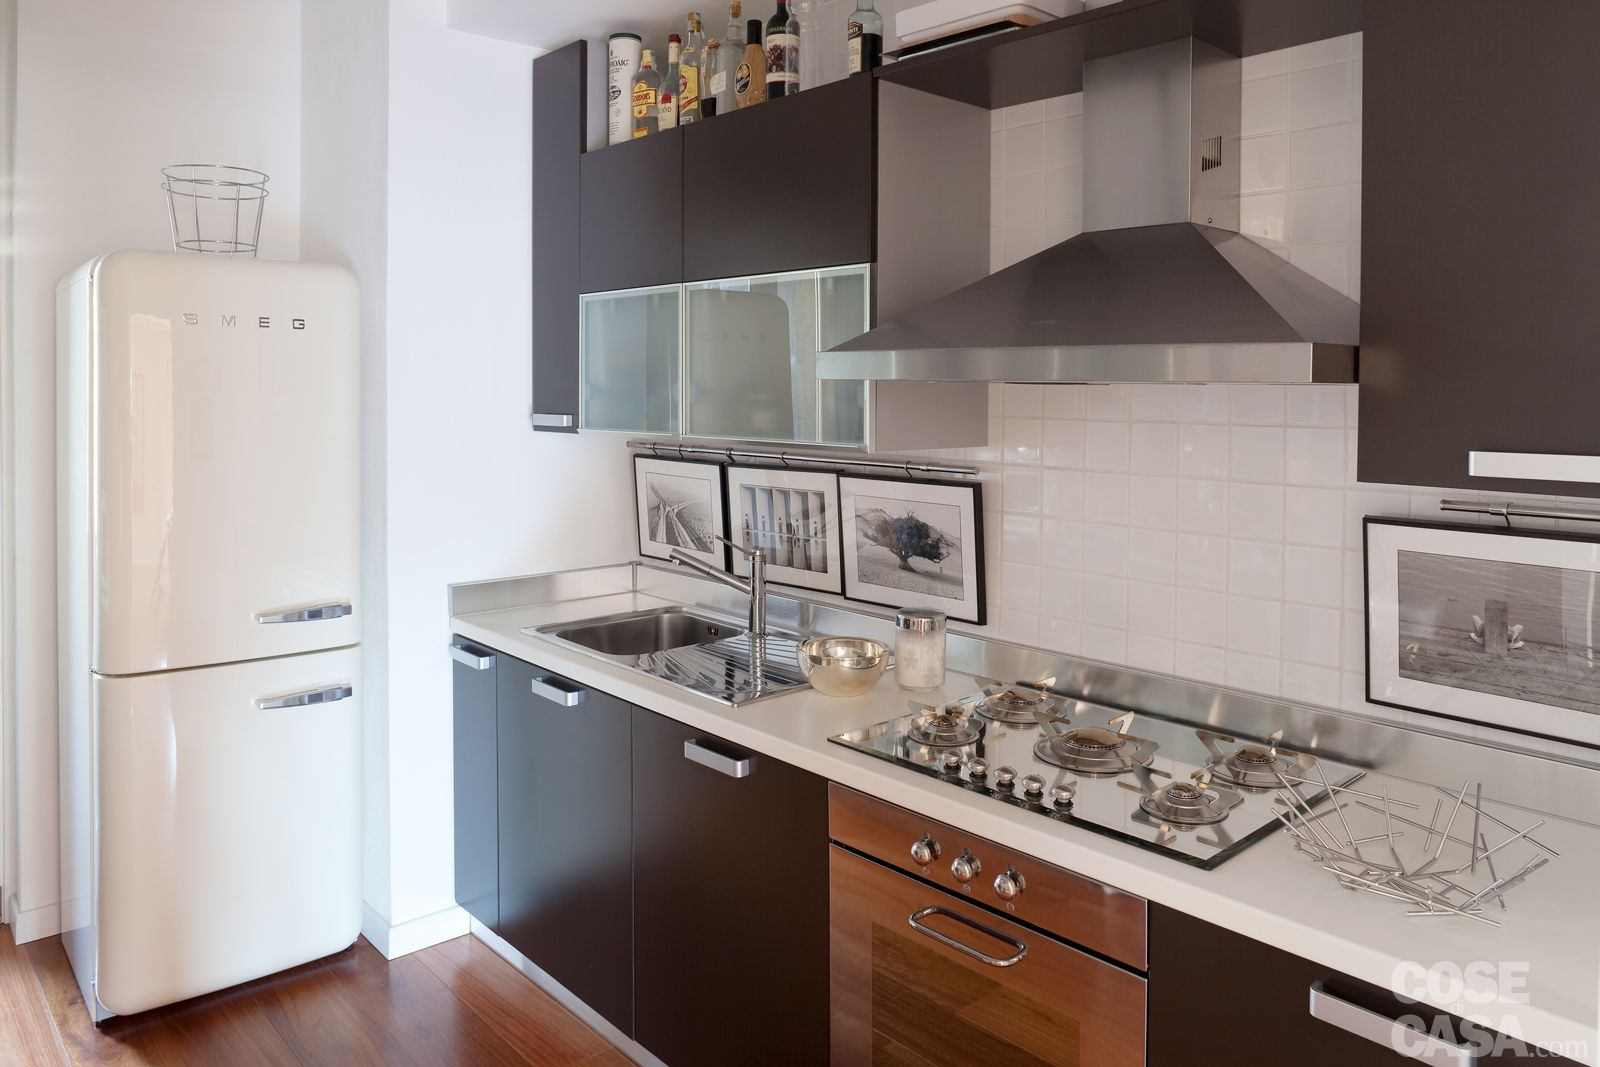 Awesome Cappe In Acciaio Per Cucine Contemporary - Design & Ideas ...